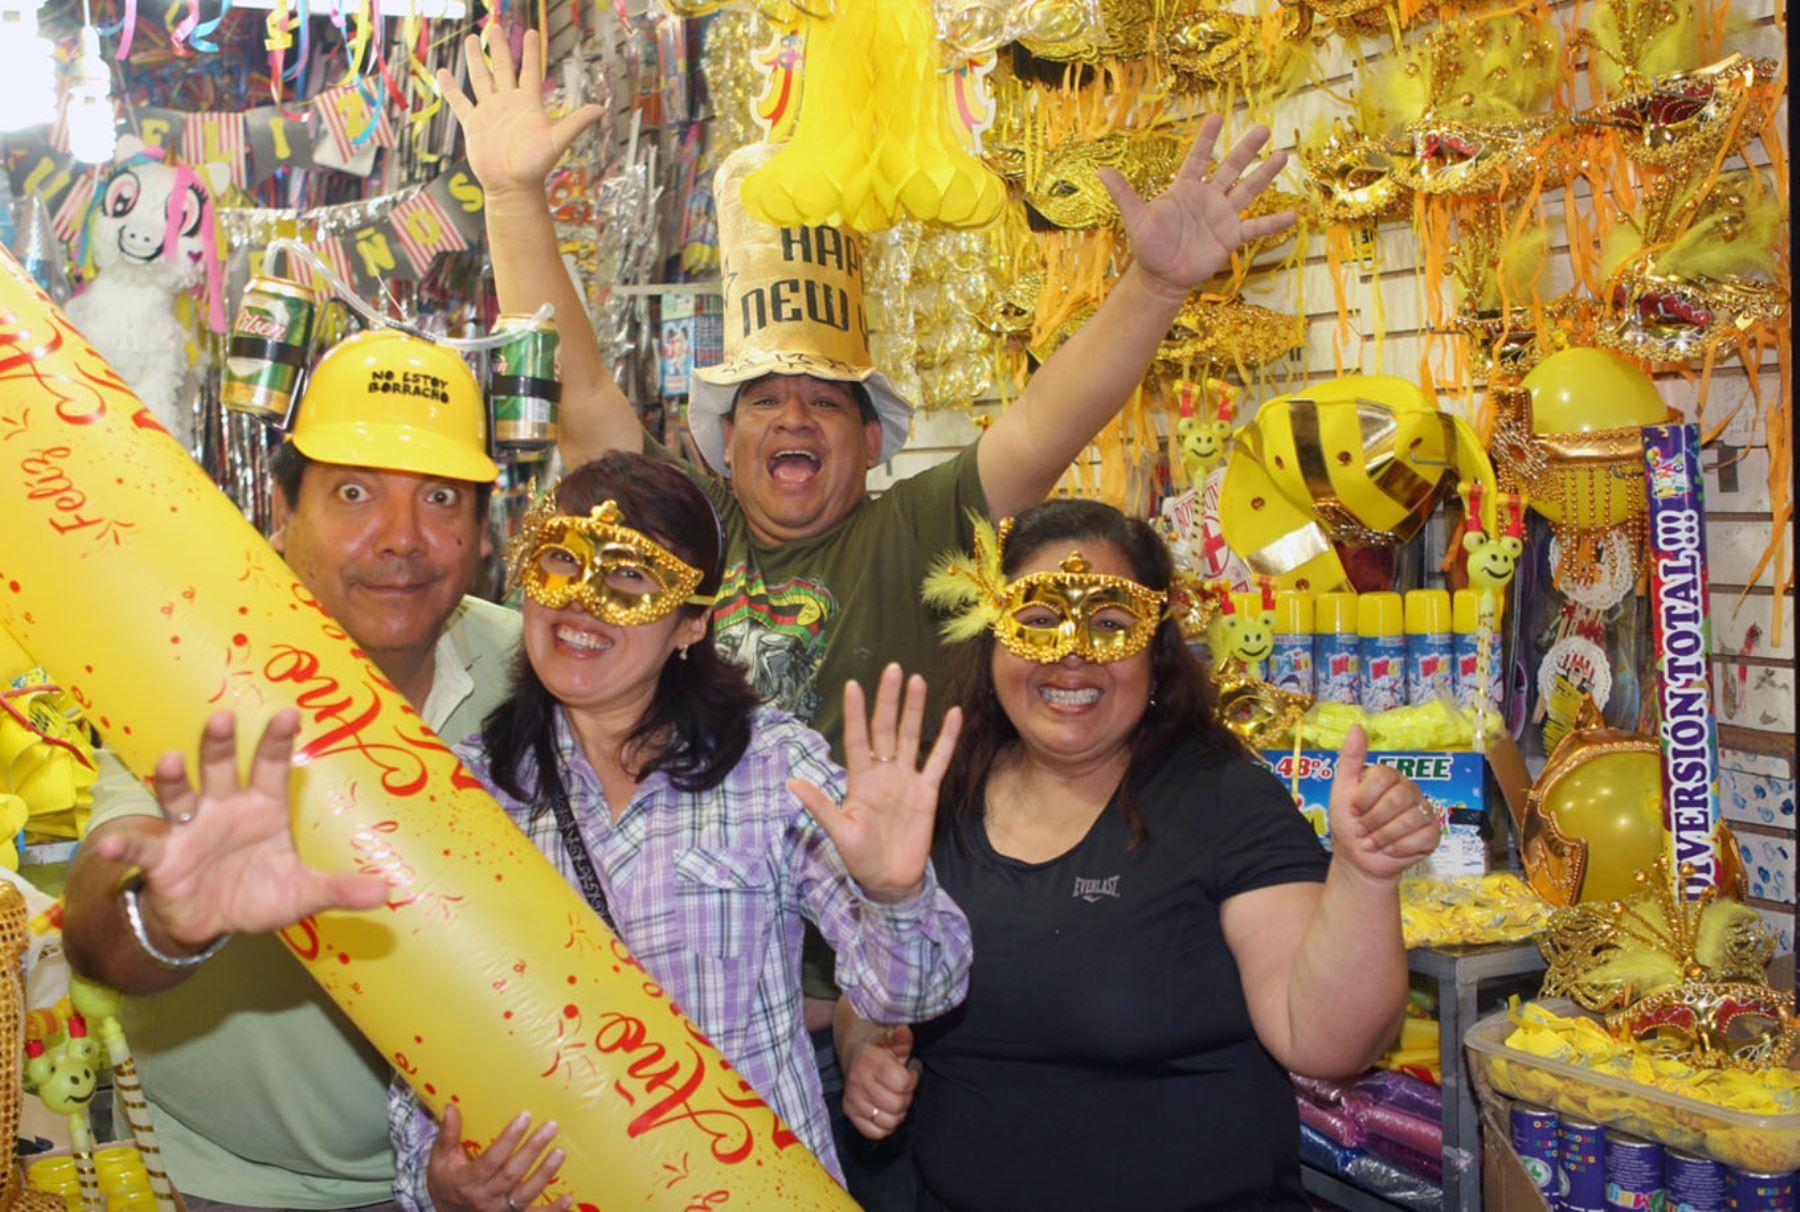 Prendas amarillas invaden zona comercial de Mesa Redonda. Foto: ANDINA/Héctor Vinces